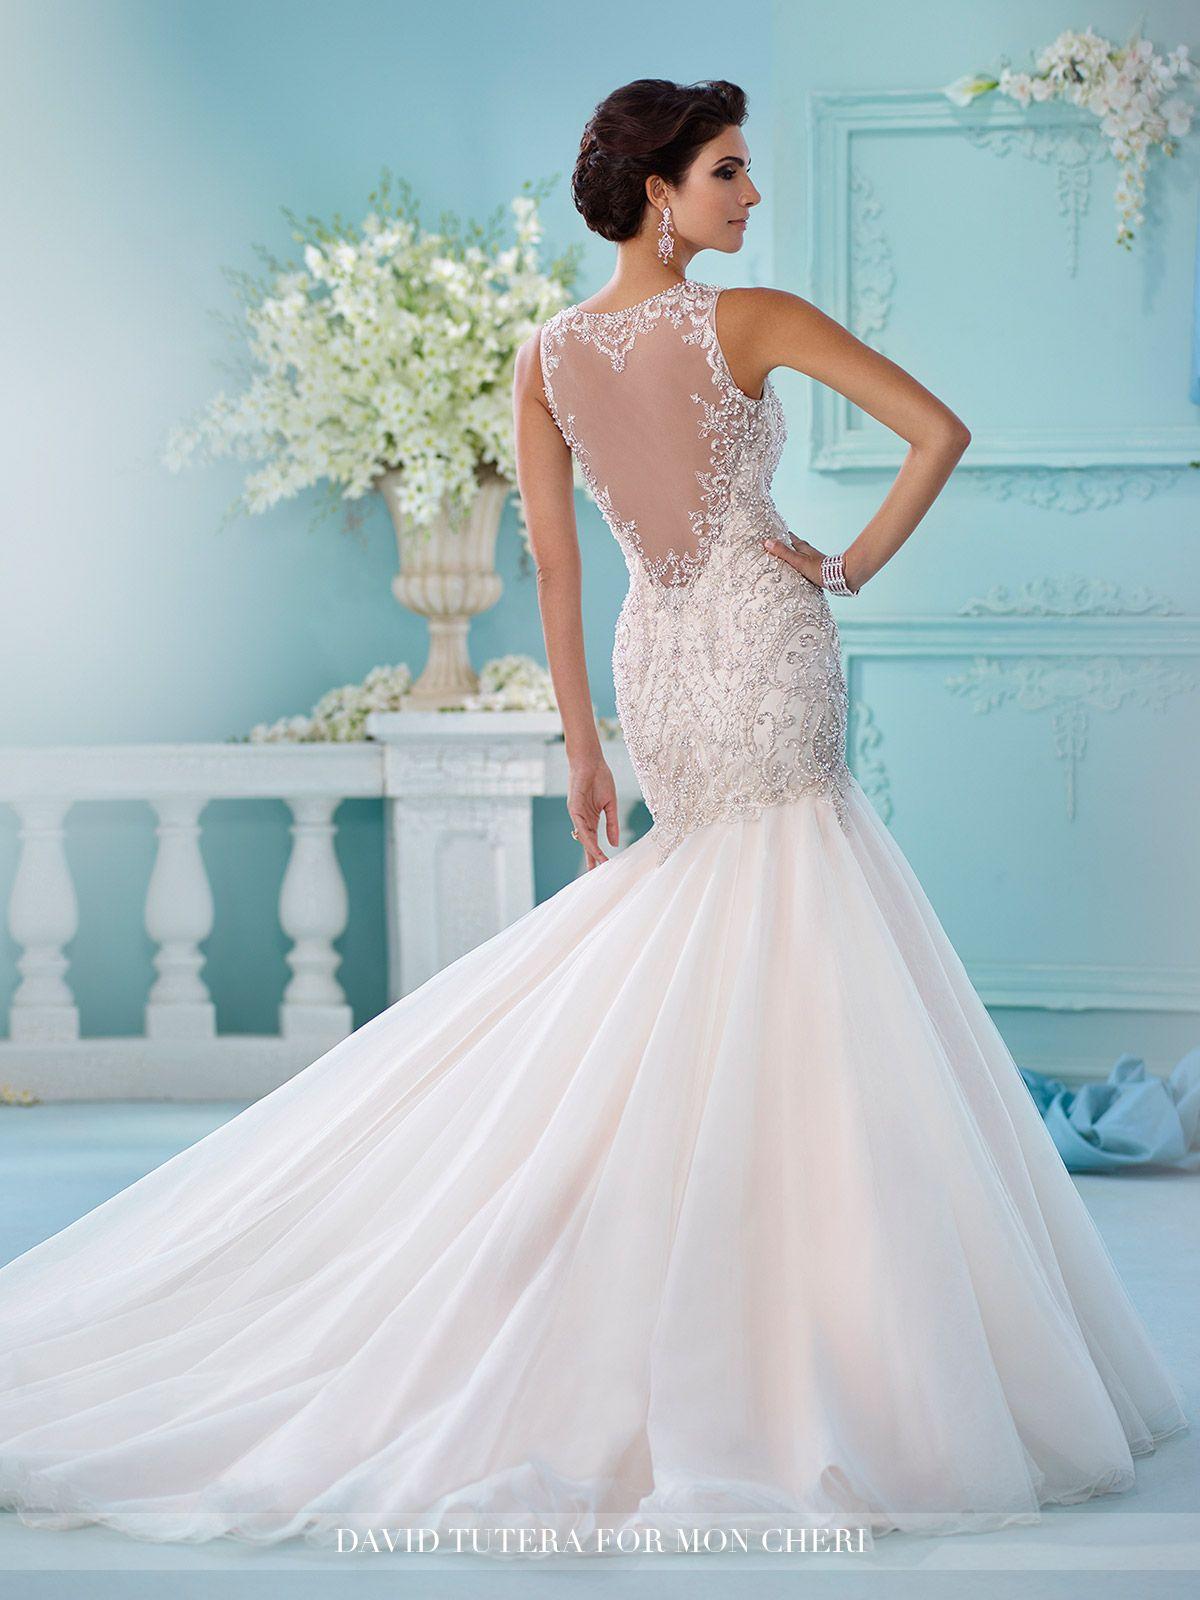 Stunning Vestidos Novia Segunda Mano Madrid Photos - Wedding Ideas ...